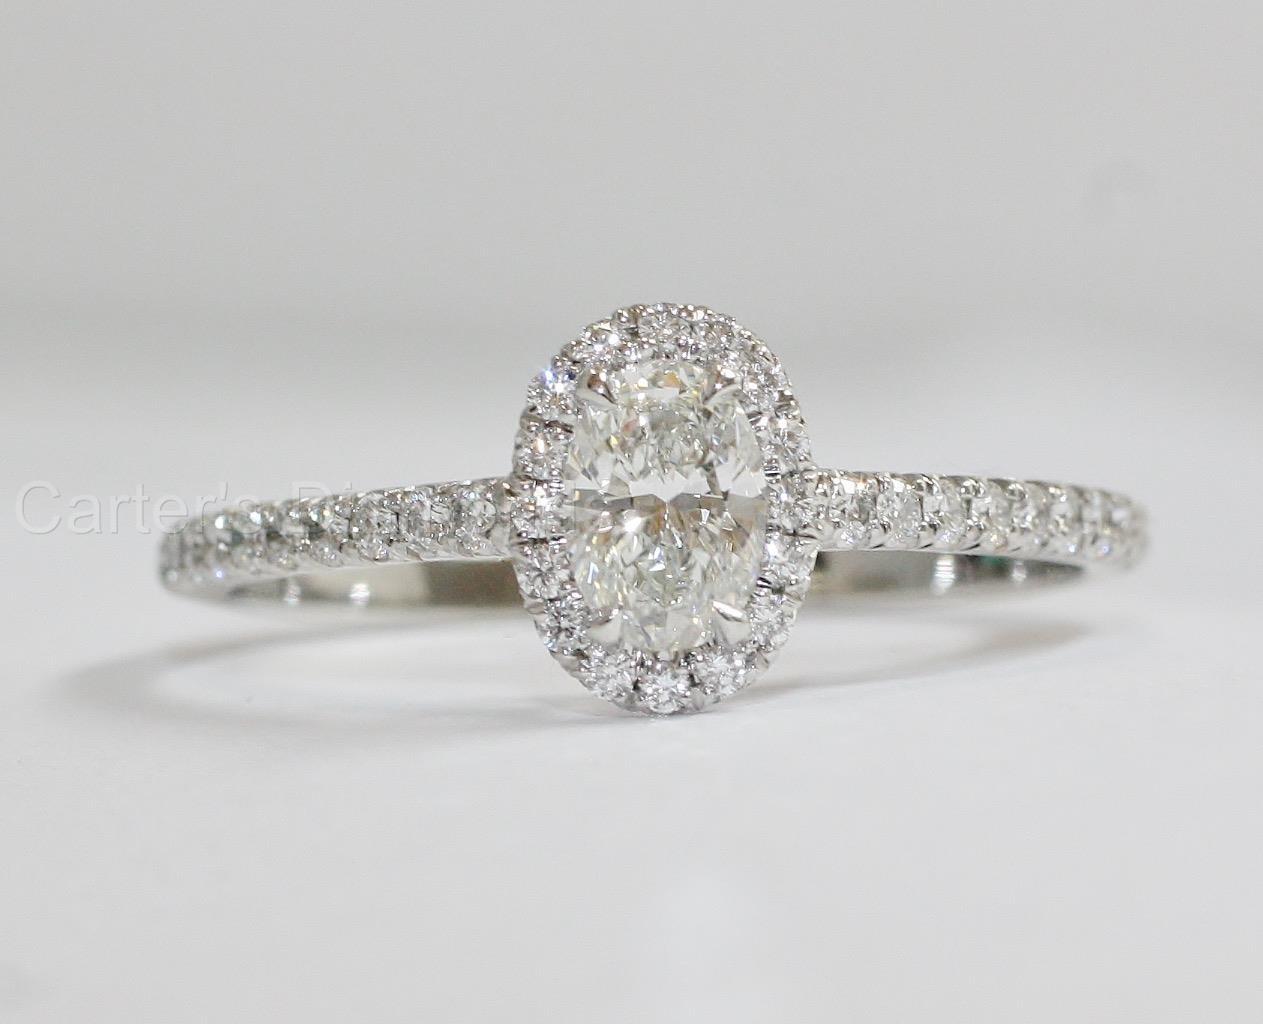 Tiffany Soleste Oval Diamond Halo Engagement Ring 70ctw W